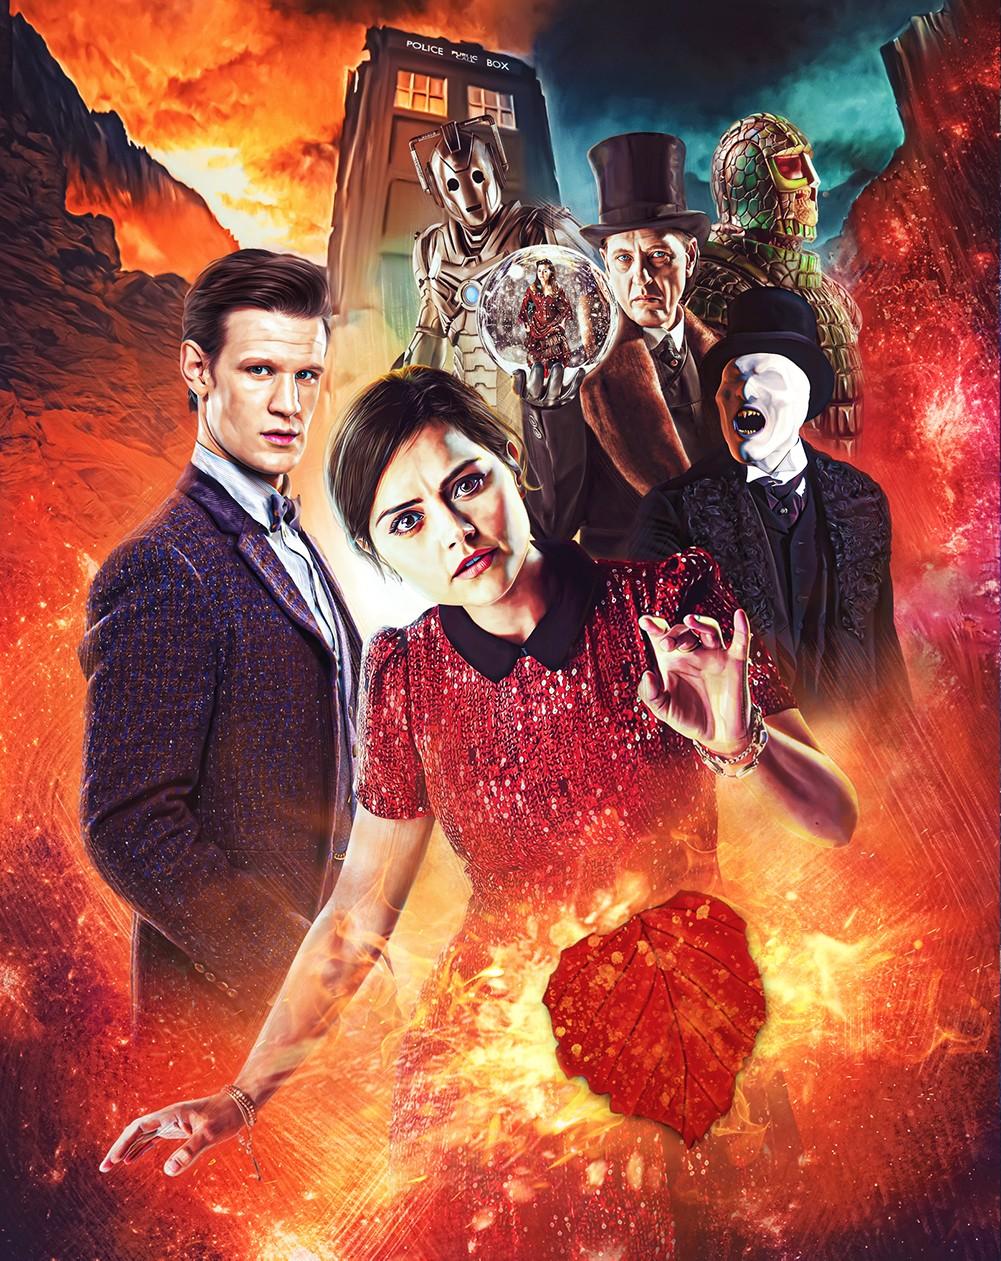 Doctor Who: The Complete Seventh Series Steelbook. Interior art by Lee Binding (c) BBC Studios Eleventh Doctor Amy Pond Clara Oswald Jenna Coleman Karen Gillan Matt Smith